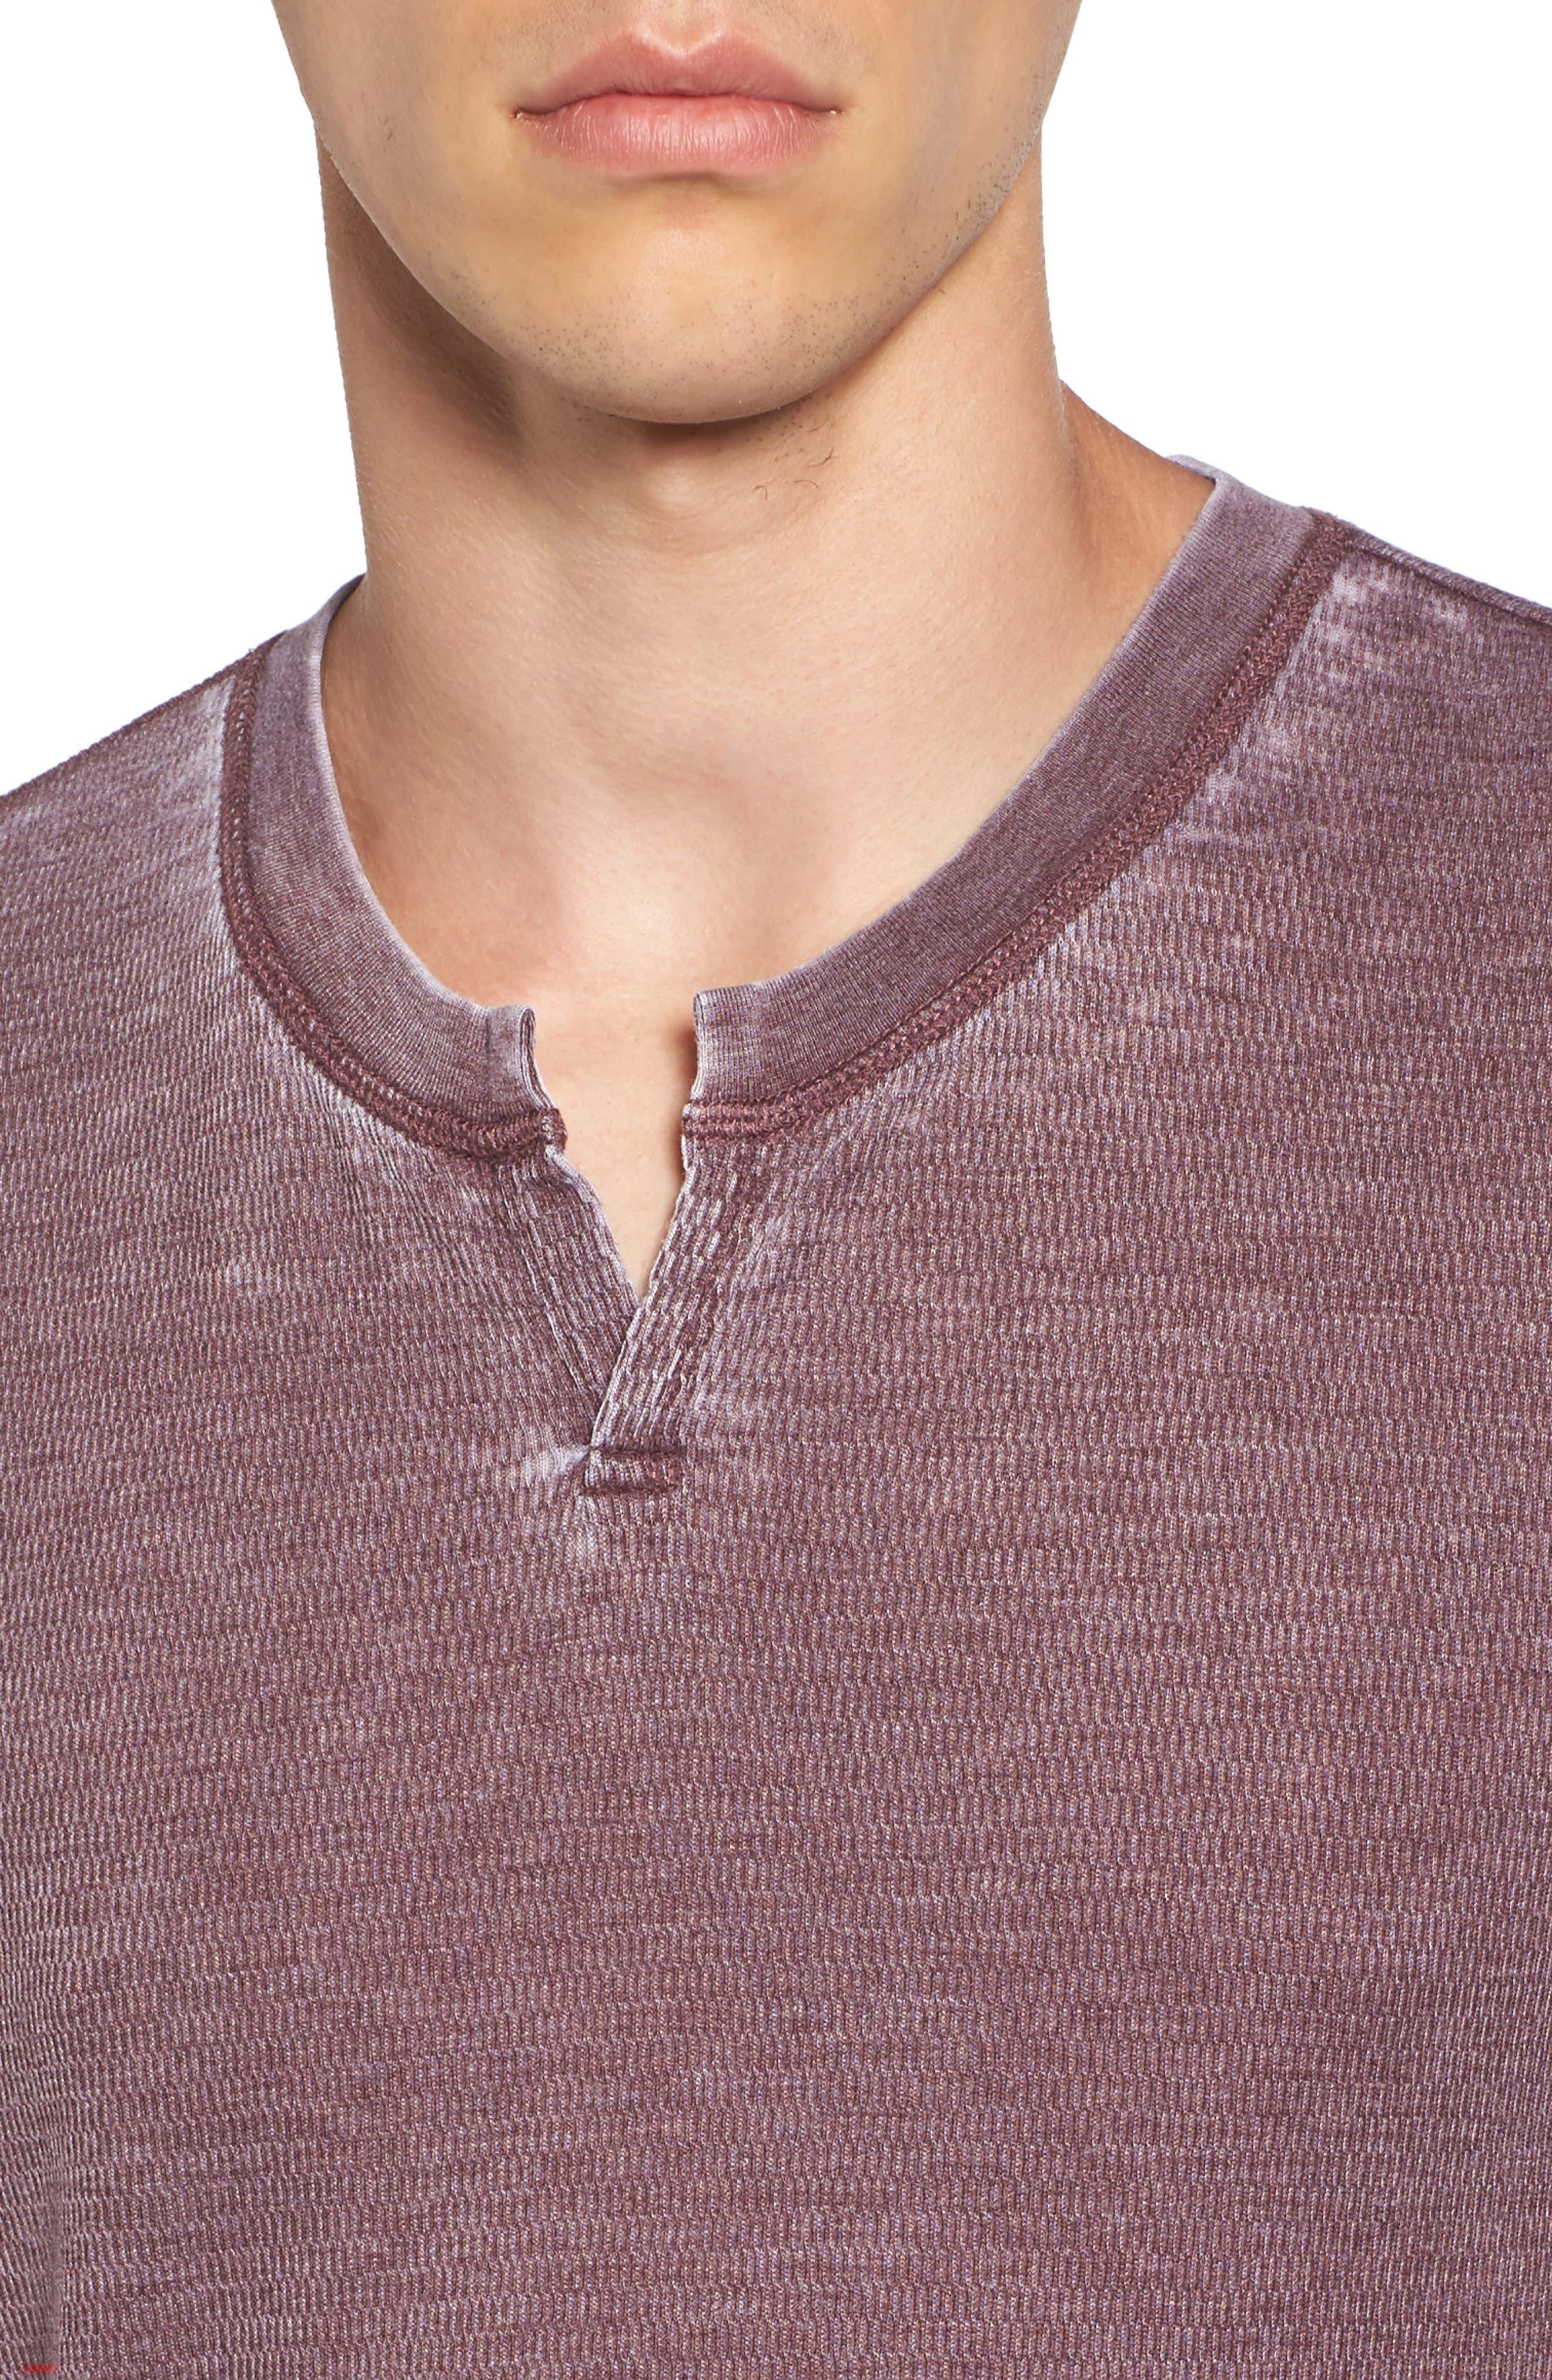 Notch Neck Thermal T-Shirt,                             Alternate thumbnail 28, color,